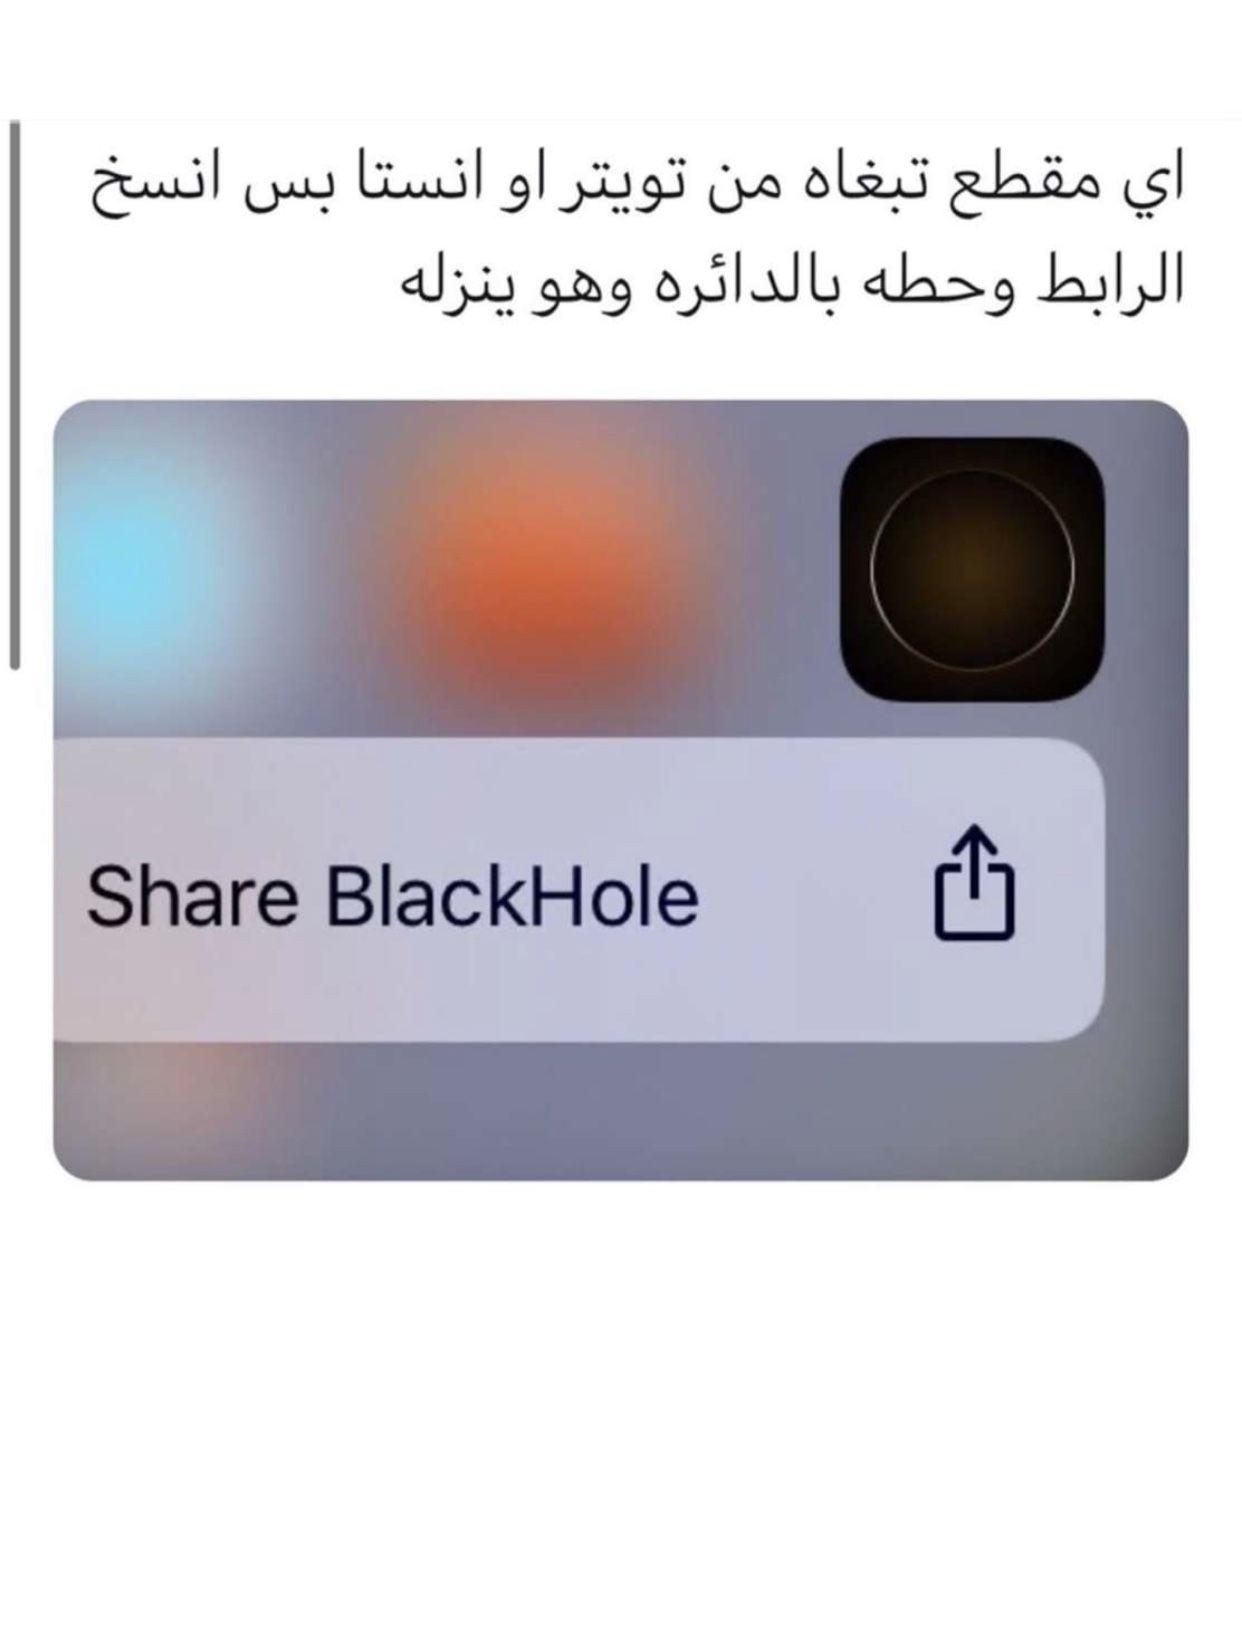 Pin By Al Zaa1 On تطبيق Lockscreen Lockscreen Screenshot Insta